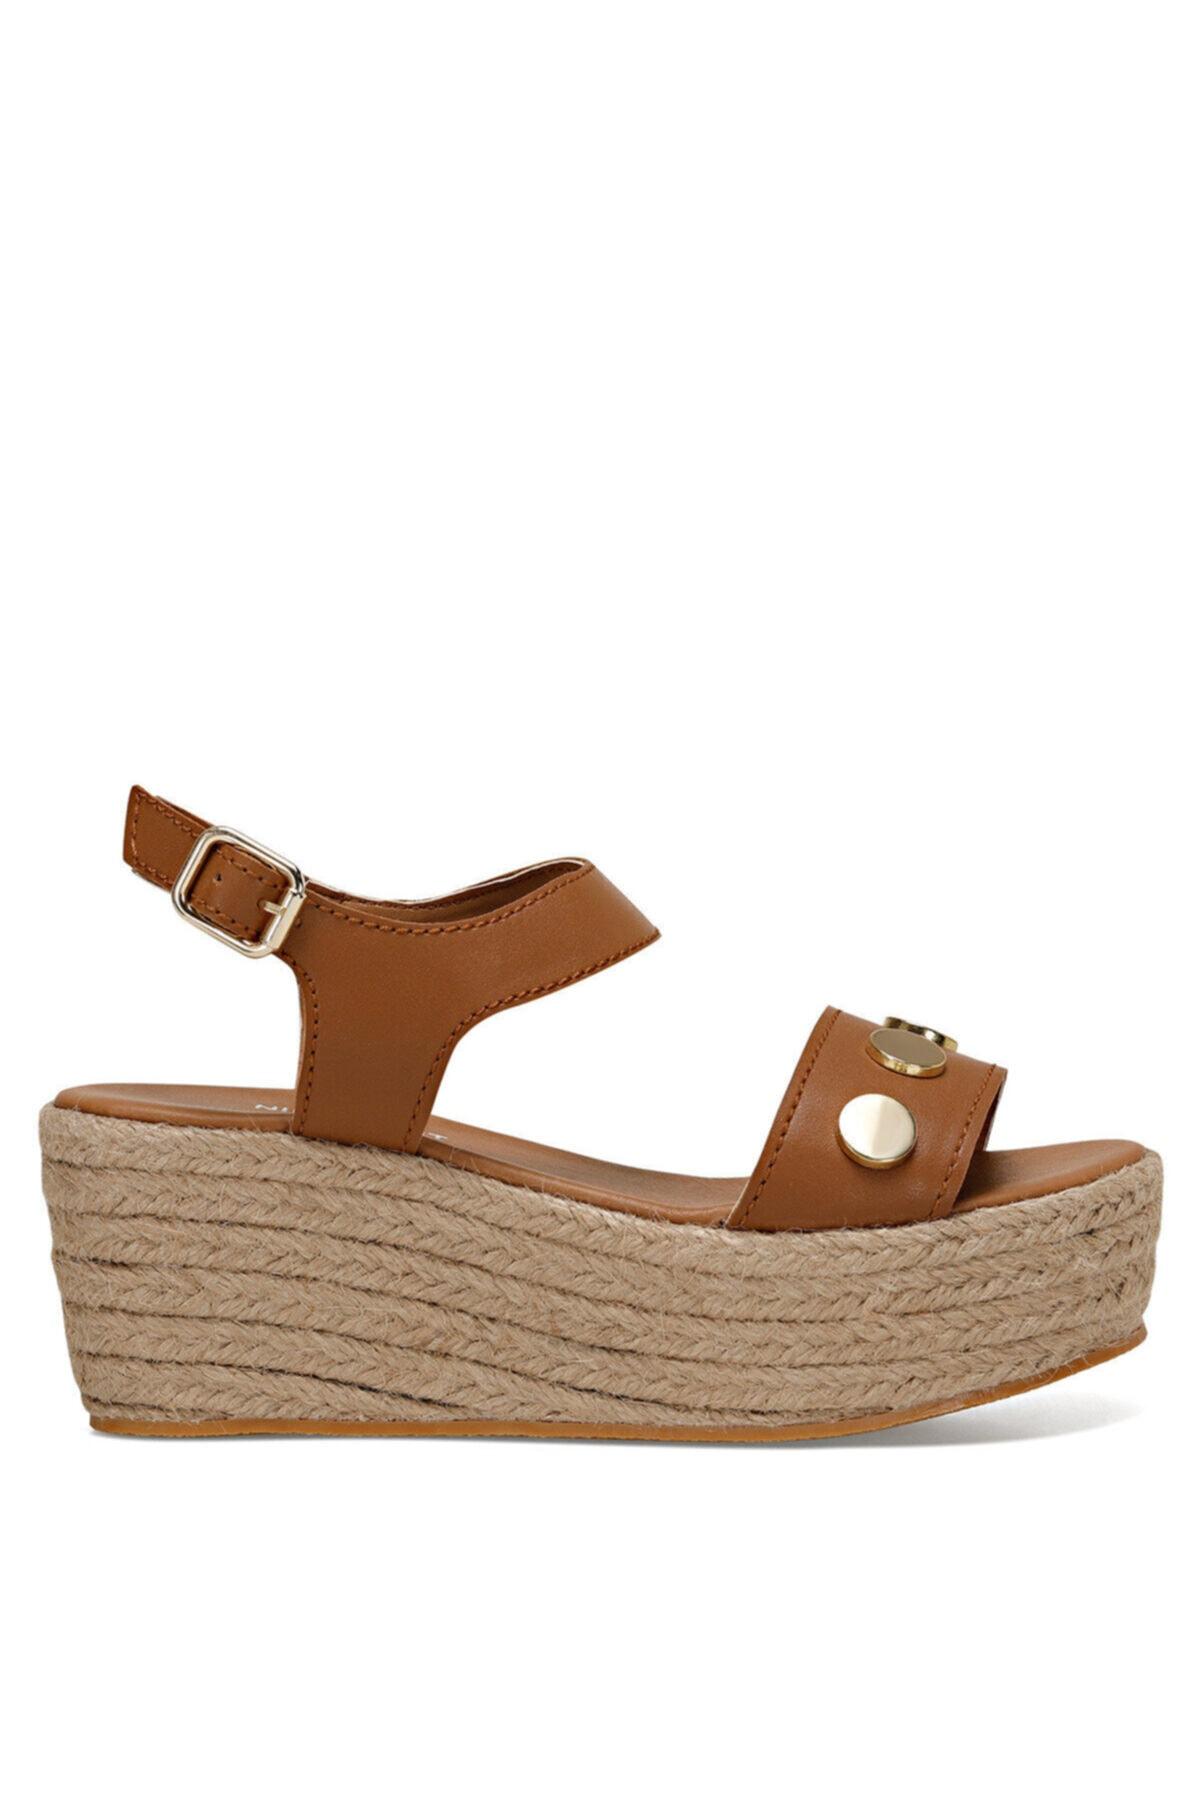 Nine West VALADON Taba Kadın Dolgu Topuklu Sandalet 100526221 1